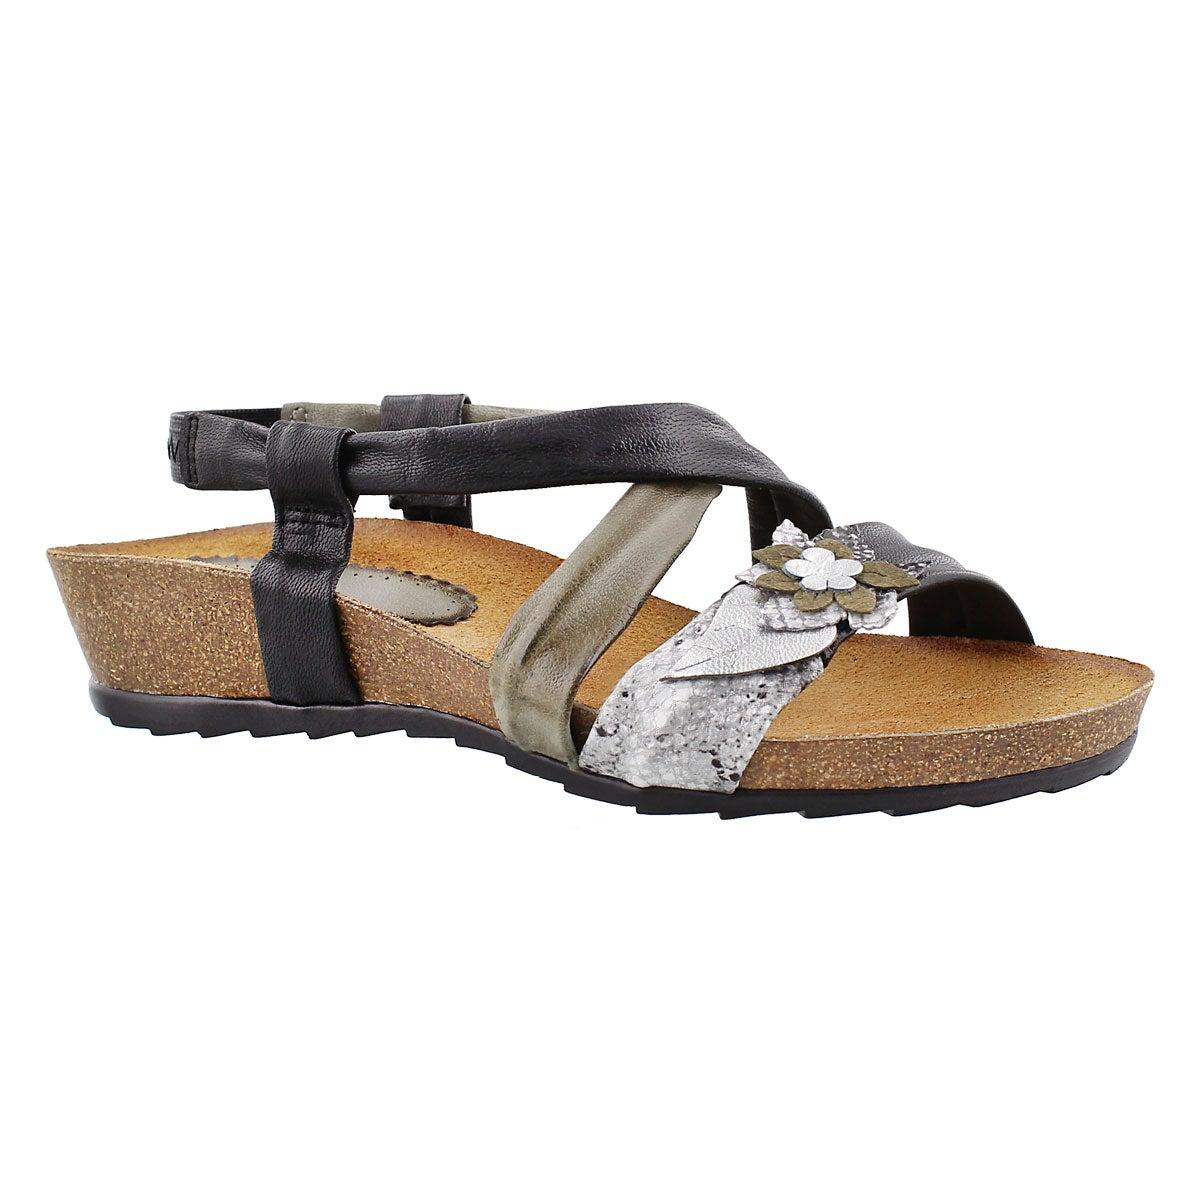 Lds Madison black casual wedge sandal